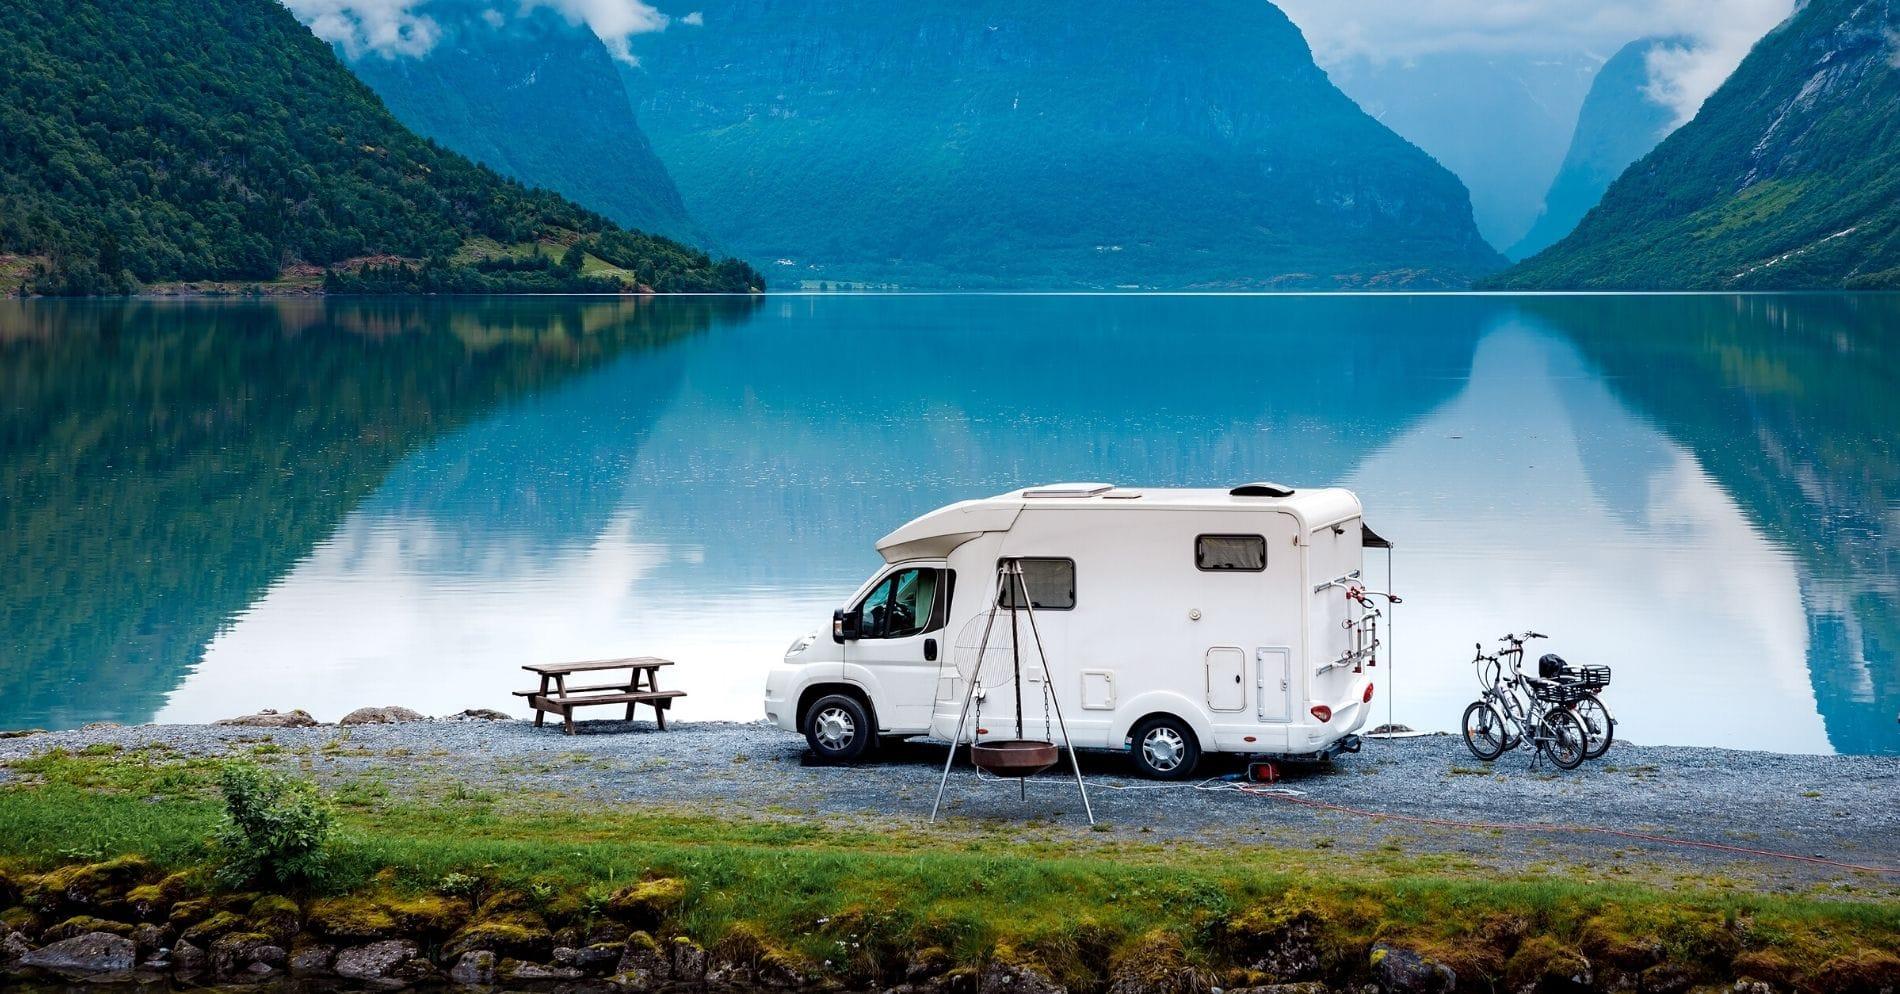 Campingprodukte Schweiz - wo Ferien beginnen